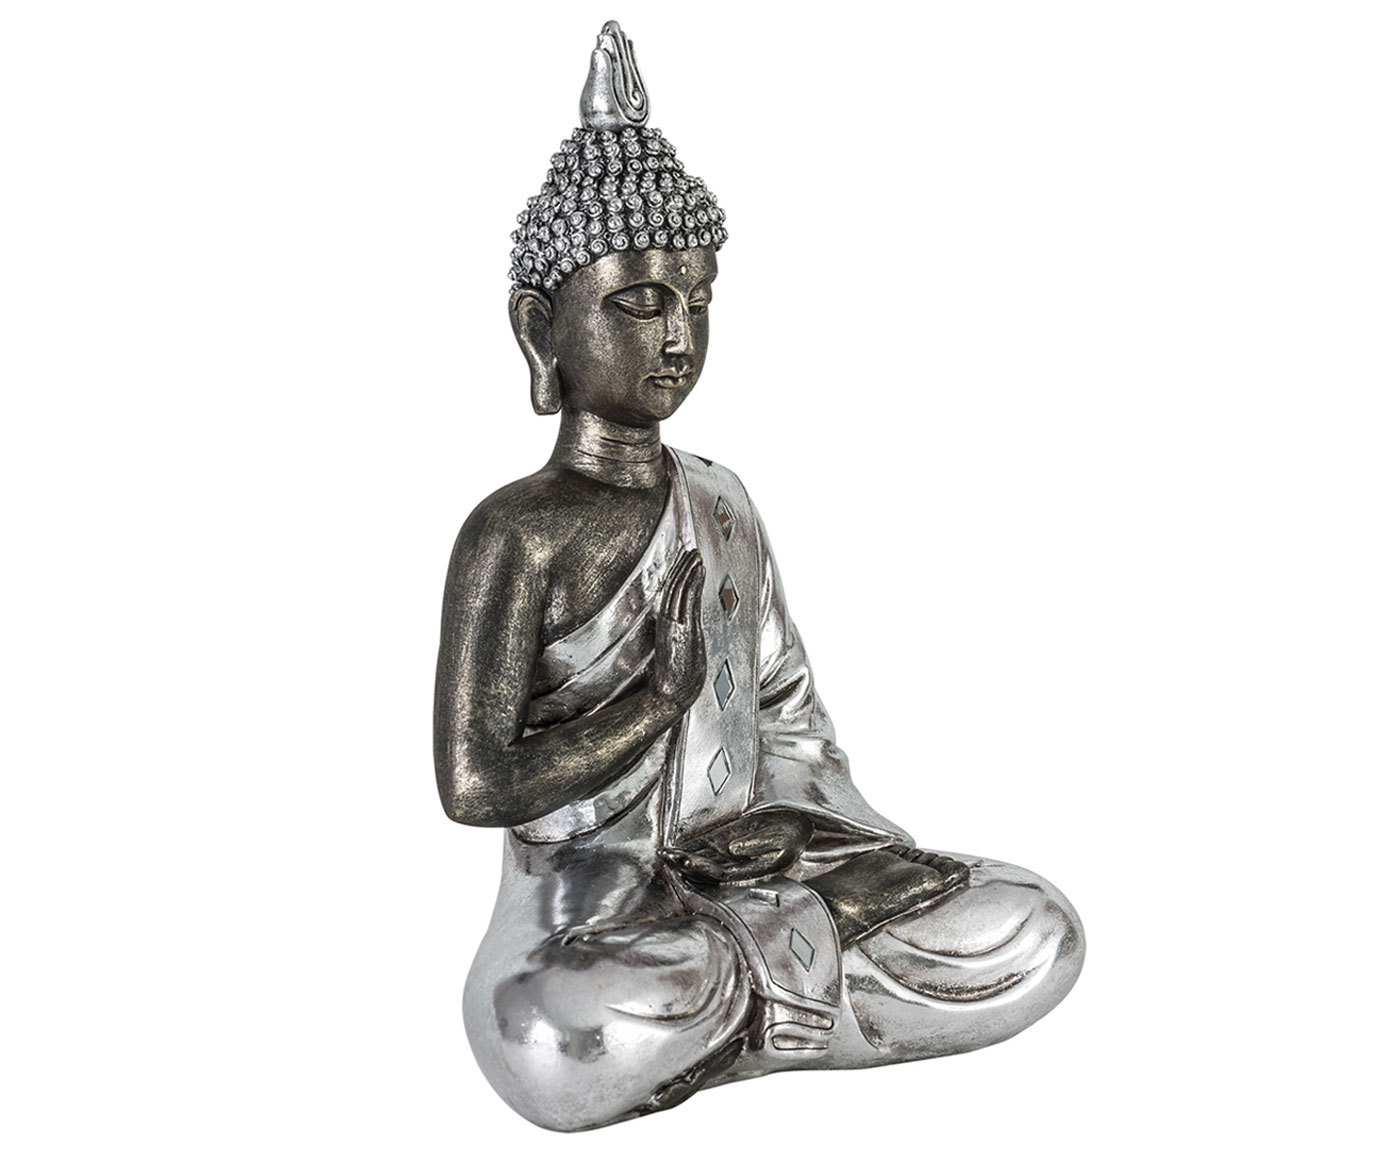 Купить Декоративный элемент Buddha Silver, inmyroom, Китай